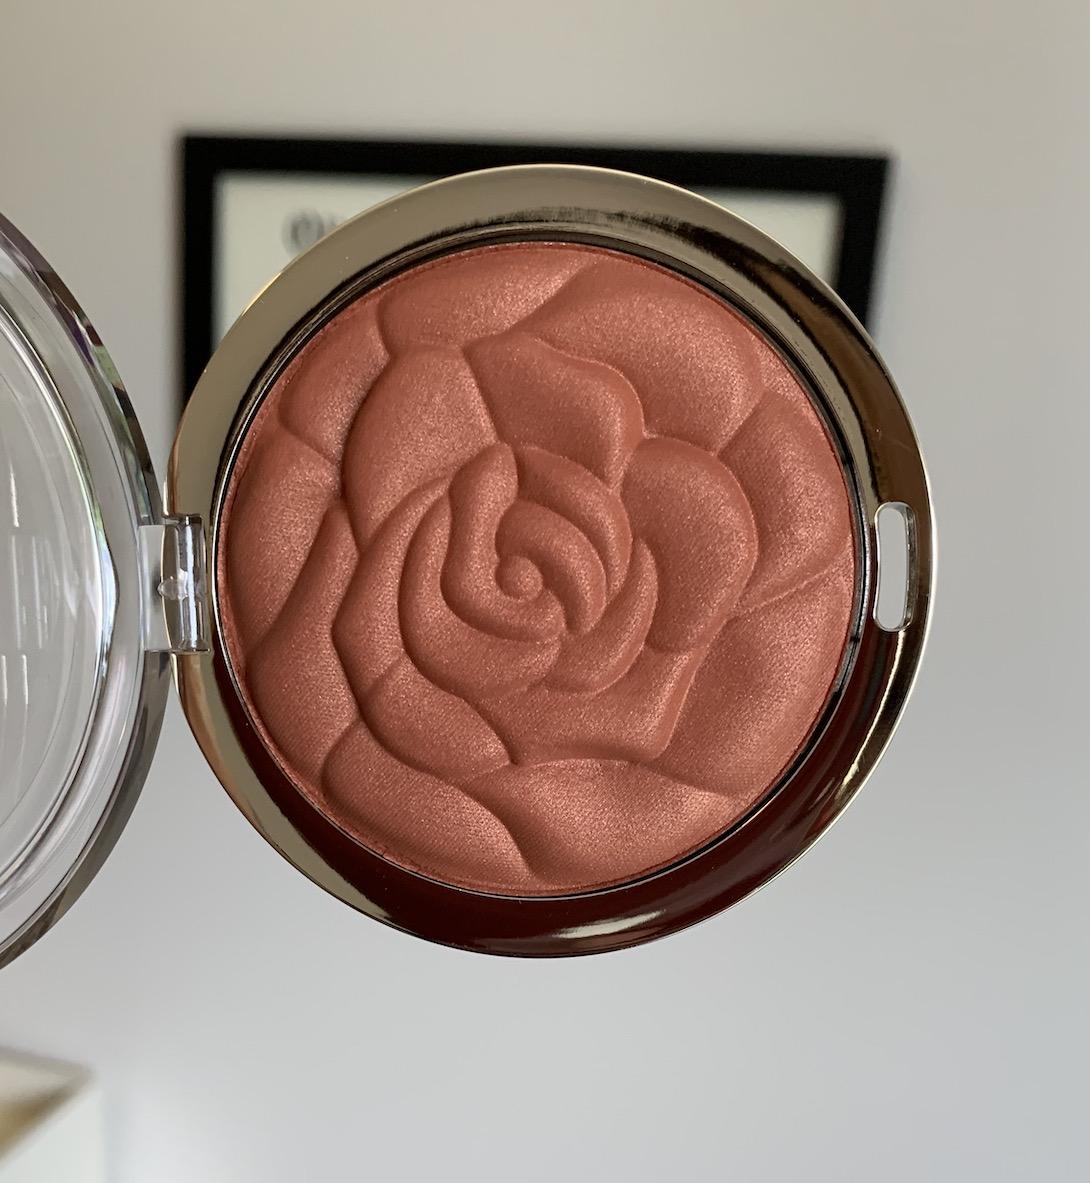 Milani Rose Powder Blush in Spiced Rose Swatch